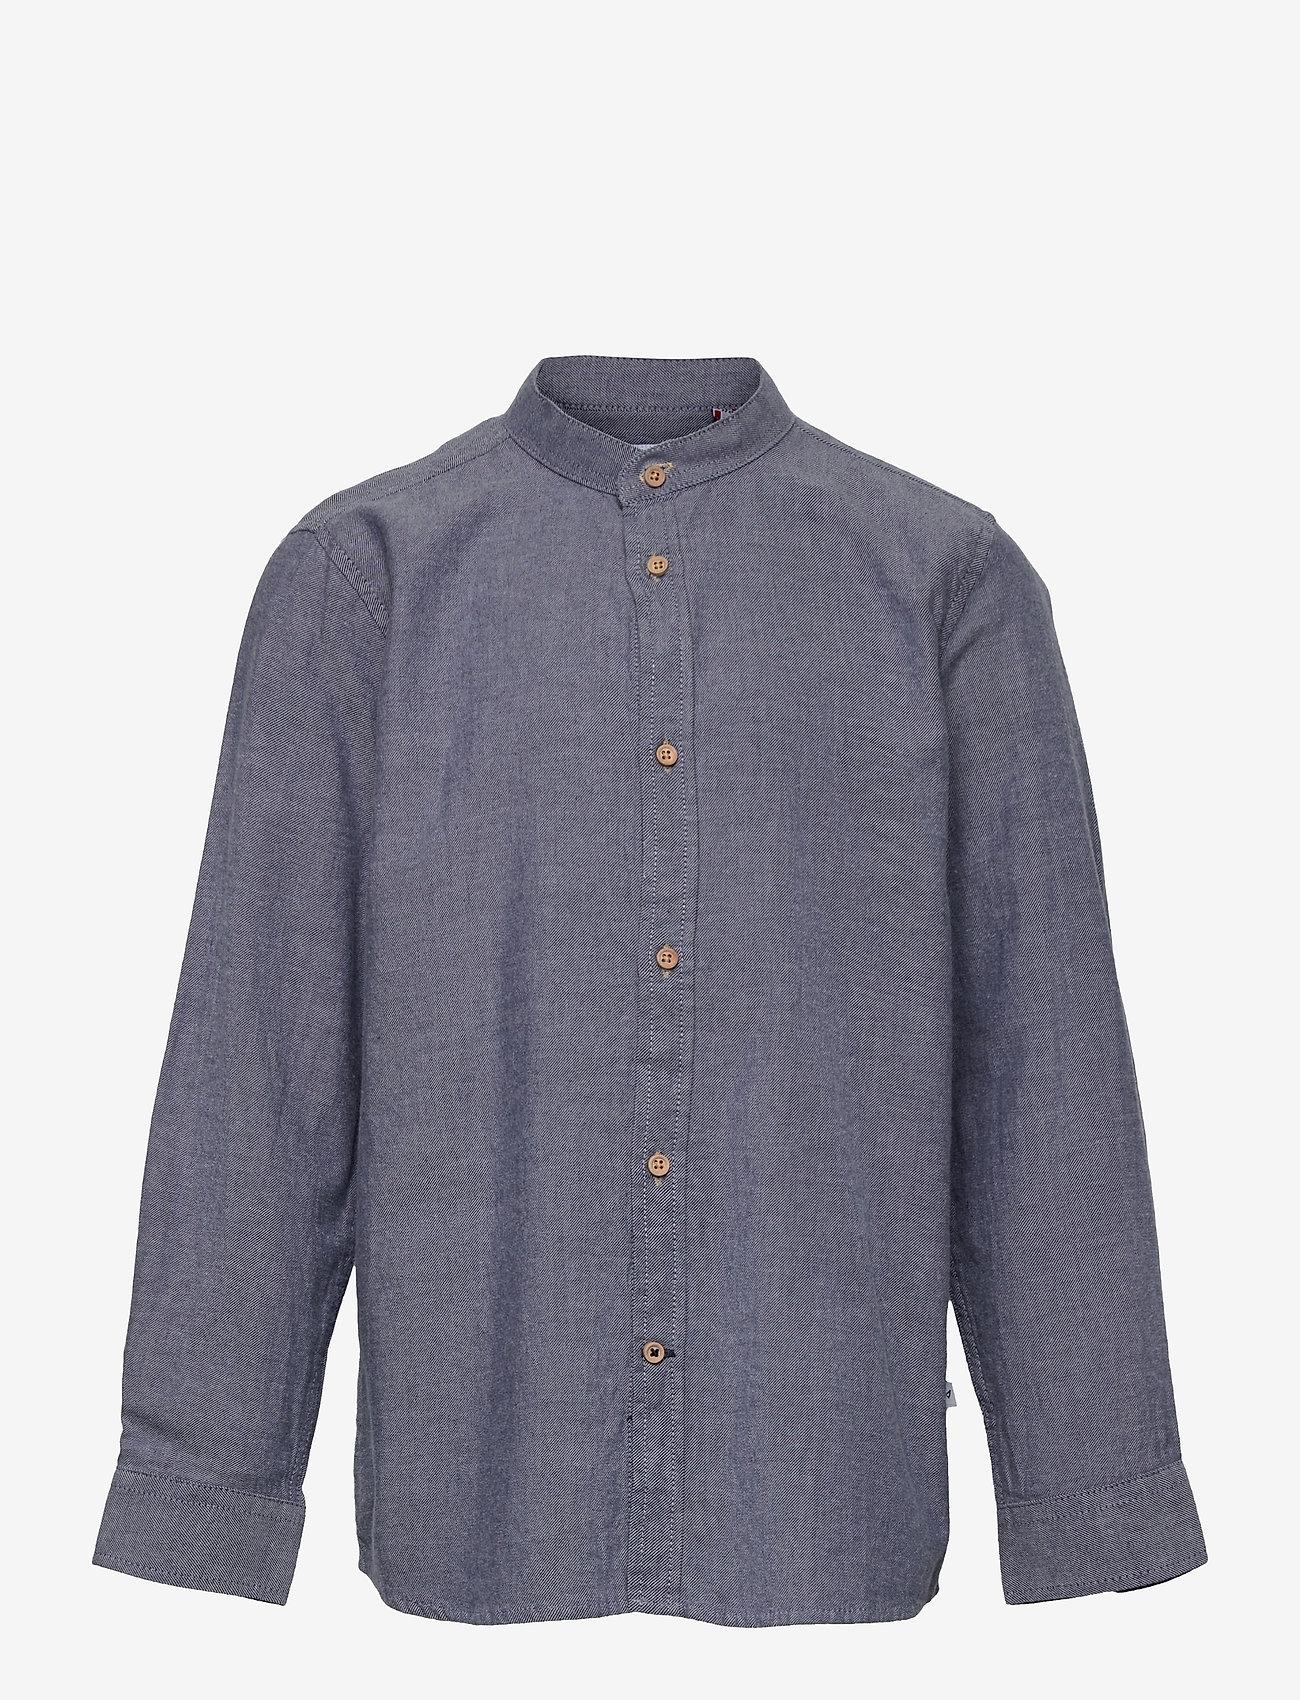 Kronstadt - Johan Henley Diego - shirts - light navy - 0